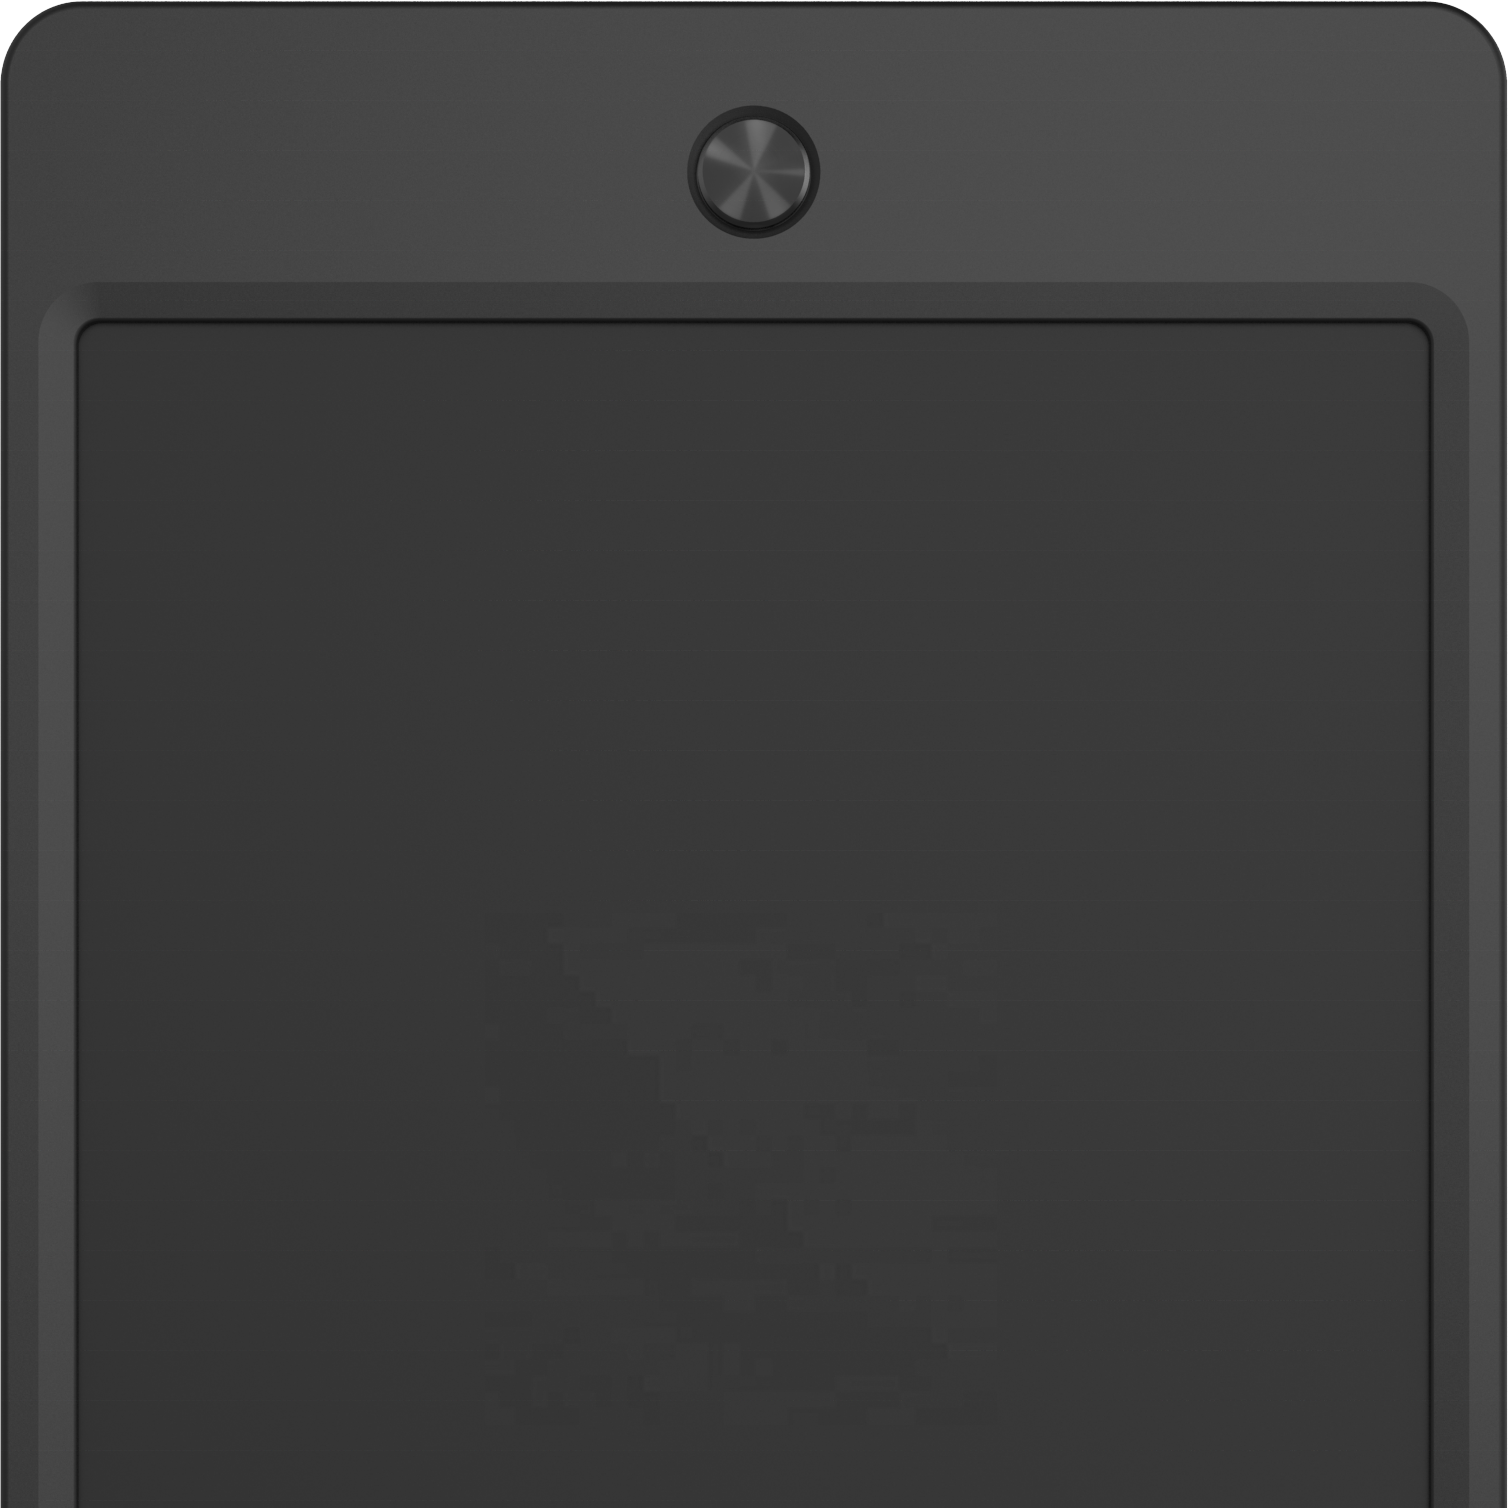 10 Inch Environmental Friendly Erasable Drawing Writing Board LCD Writing Tablet - Yola WhiteBoard | szyola.net